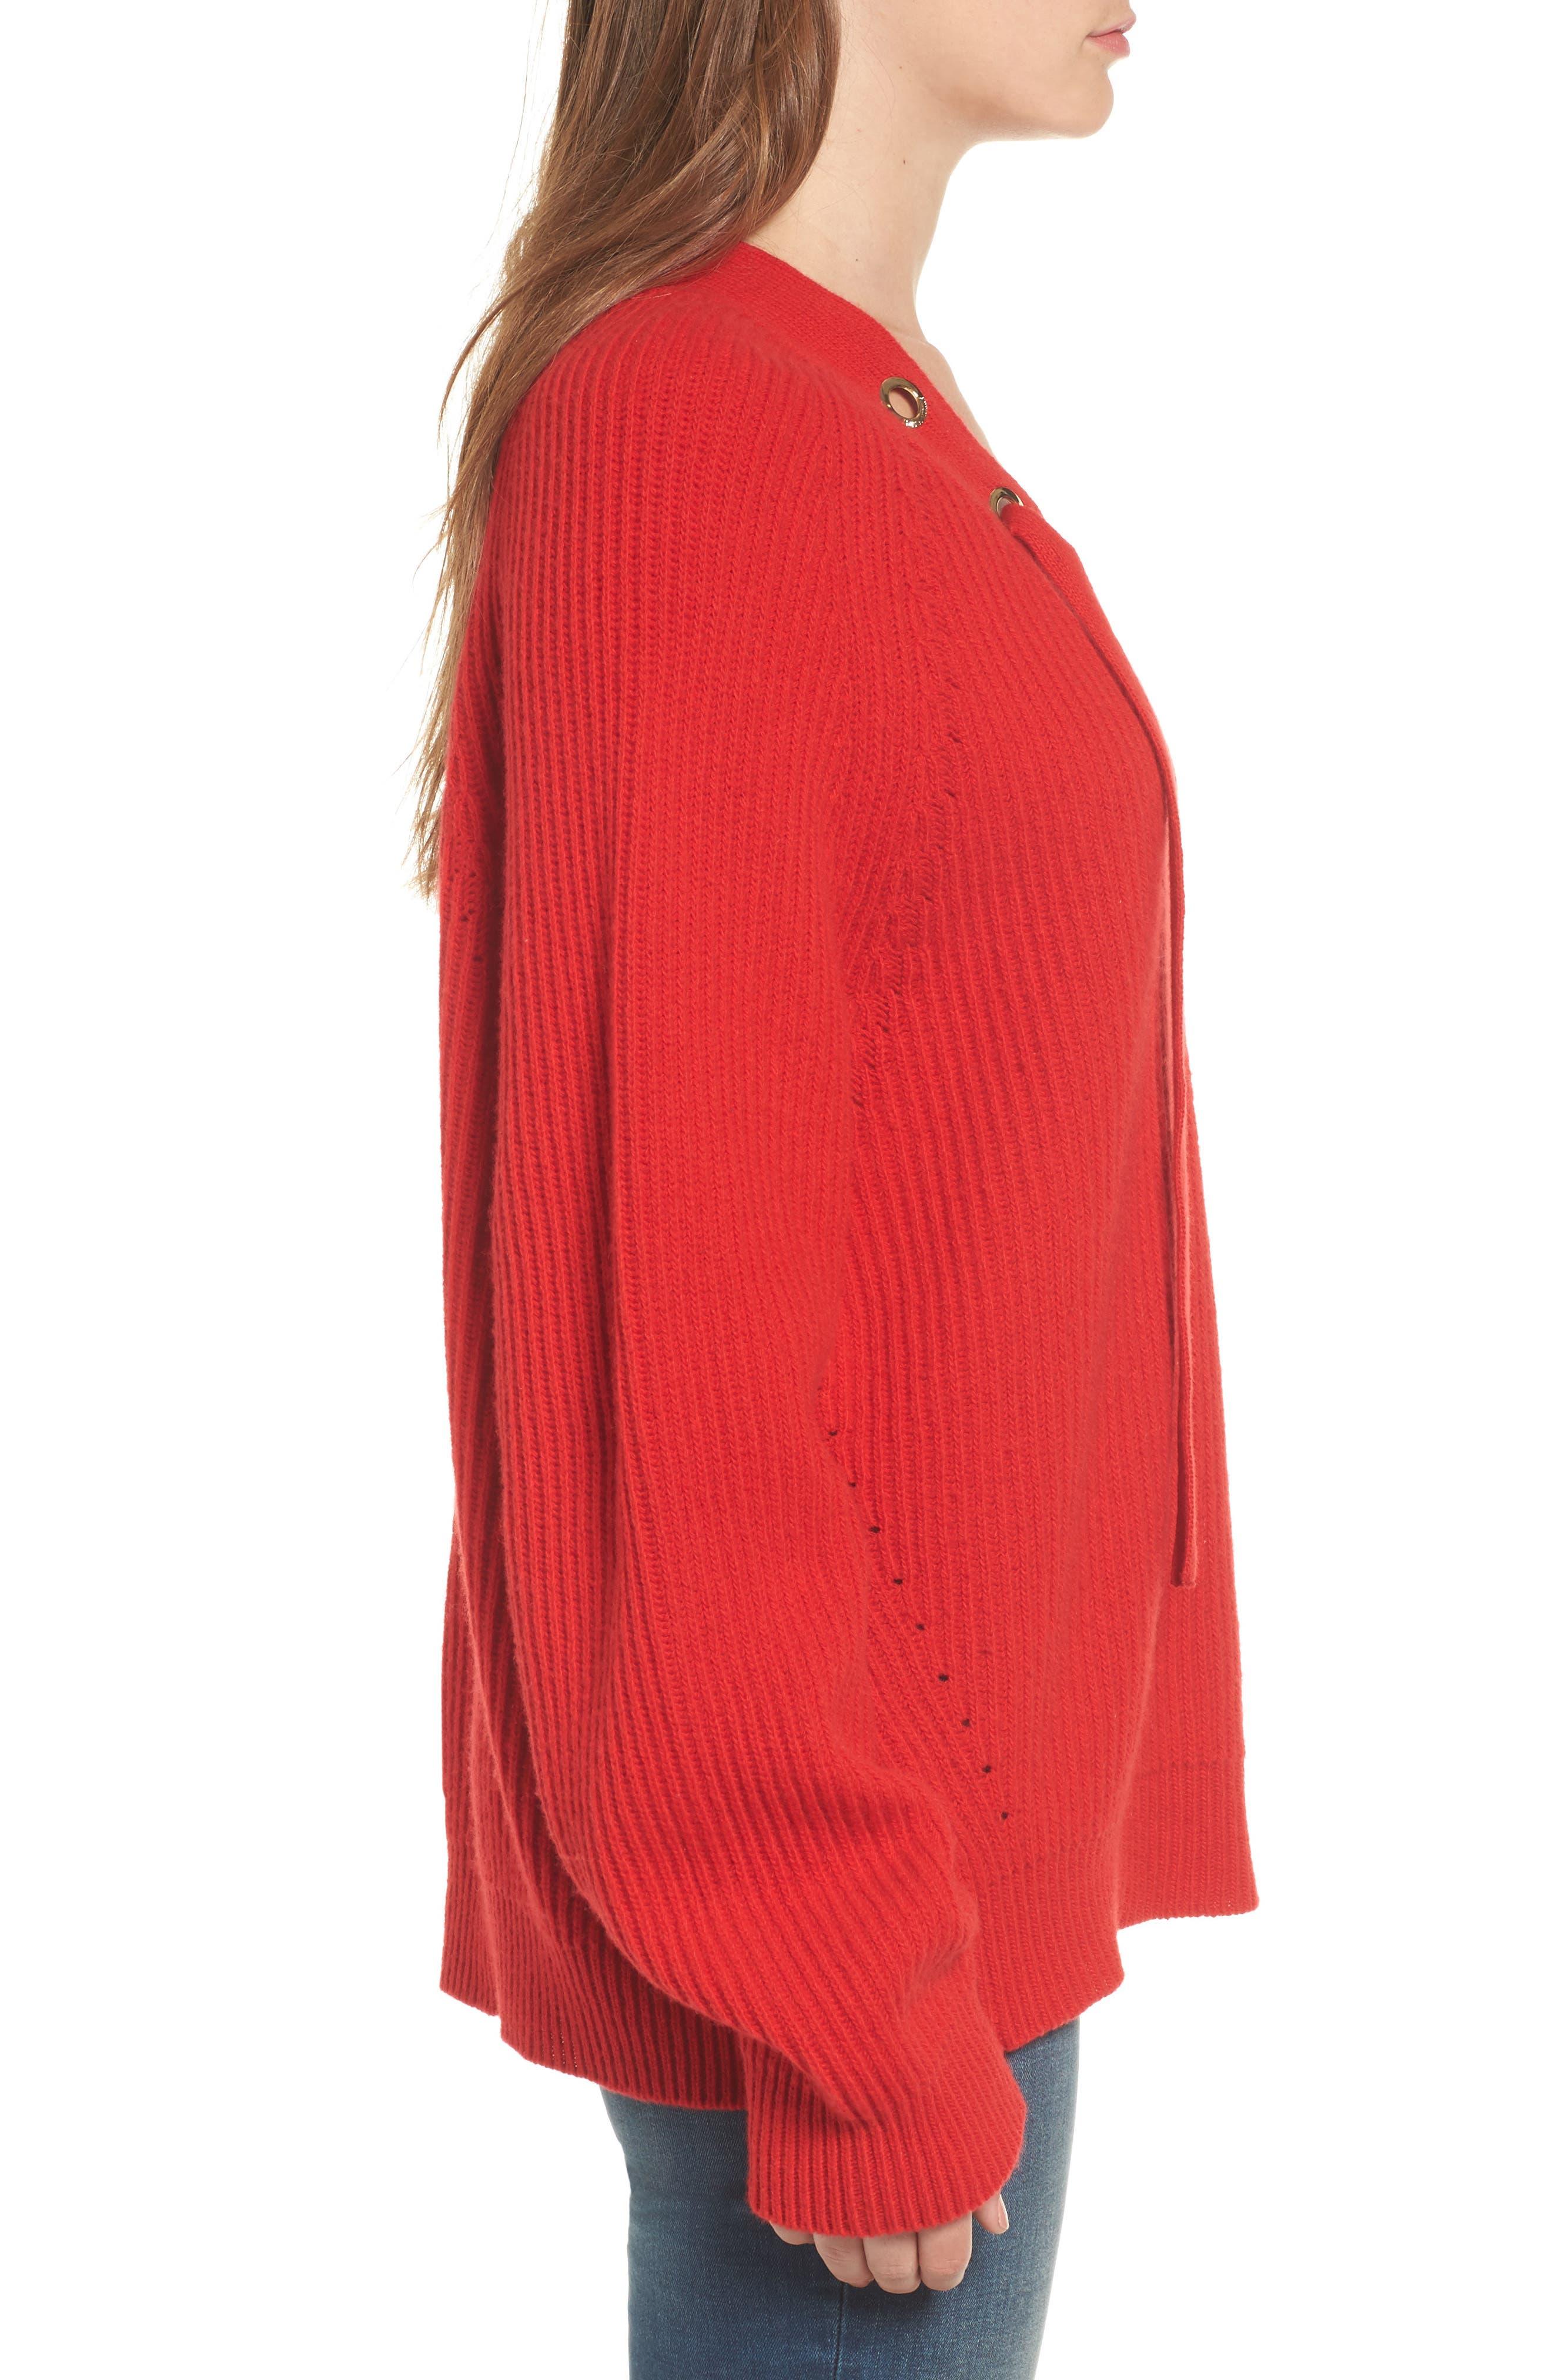 Kassy Wool Blend Sweater,                             Alternate thumbnail 3, color,                             600